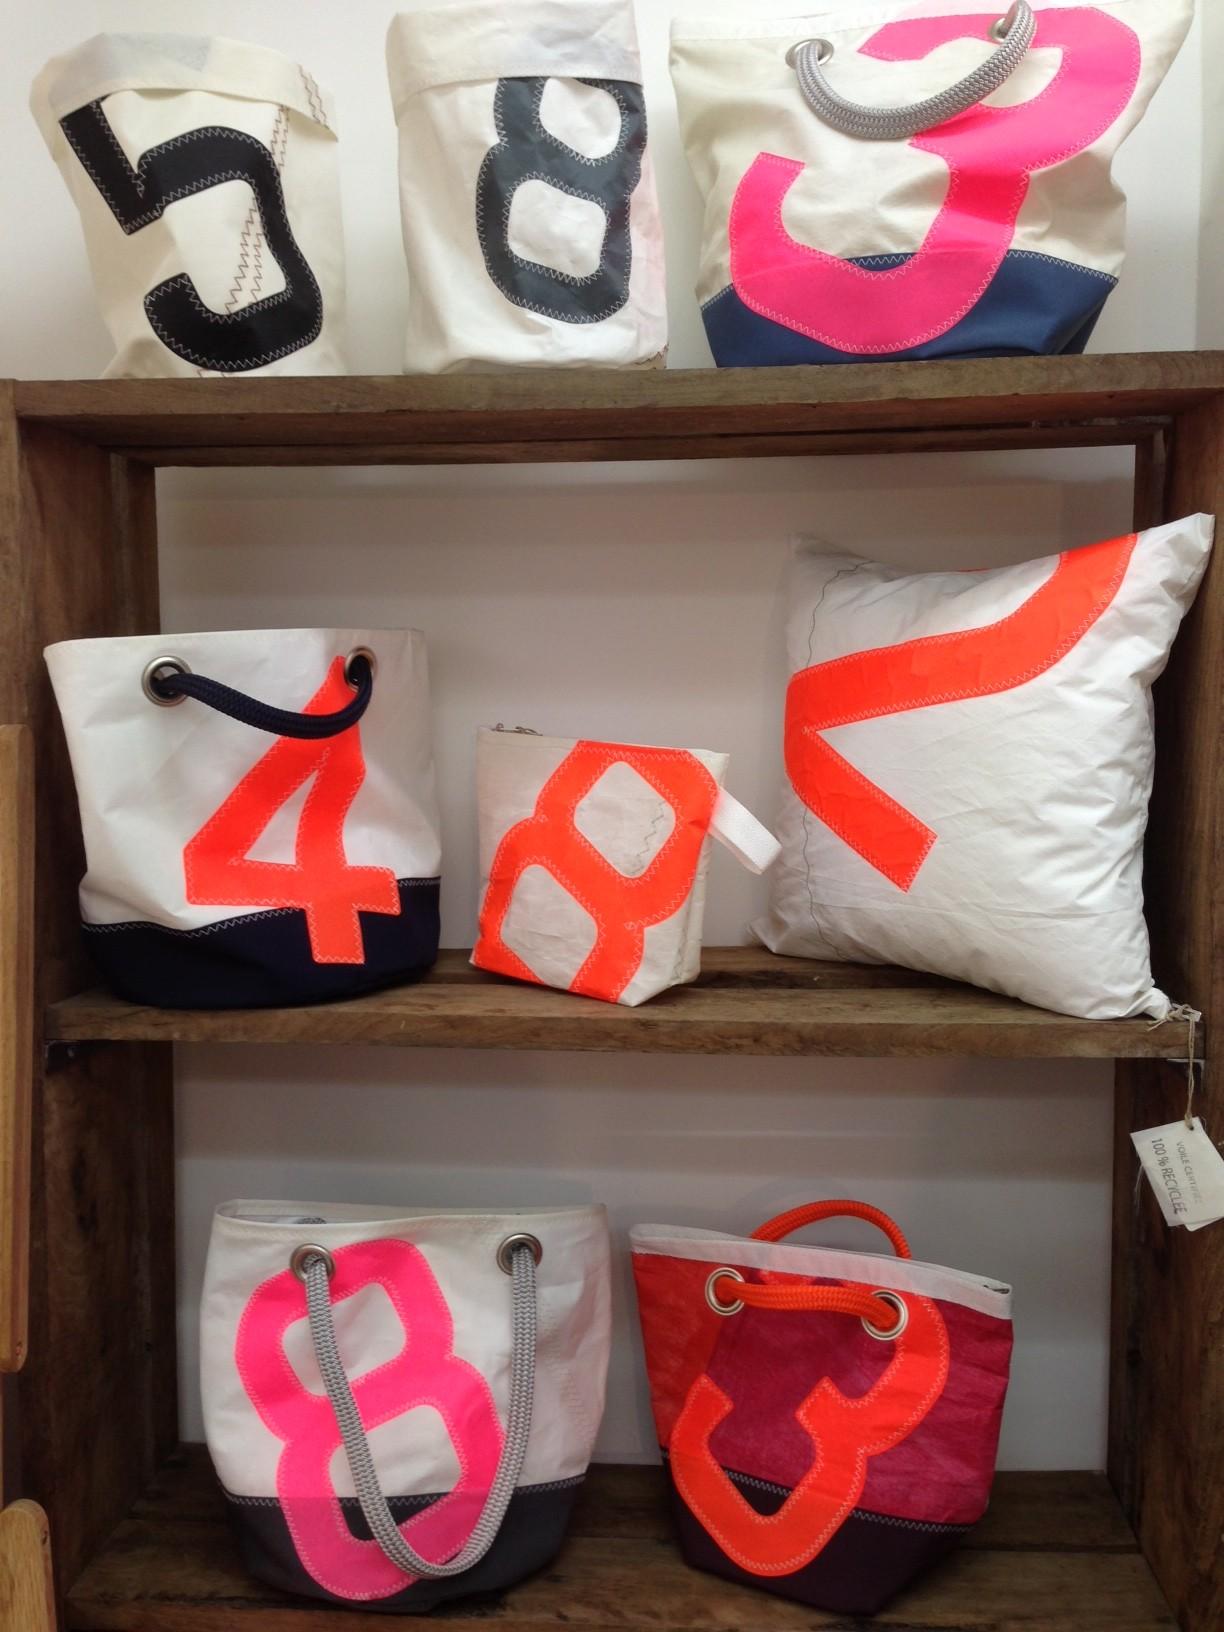 727 sailbags : on met les voiles ! - the parisienne